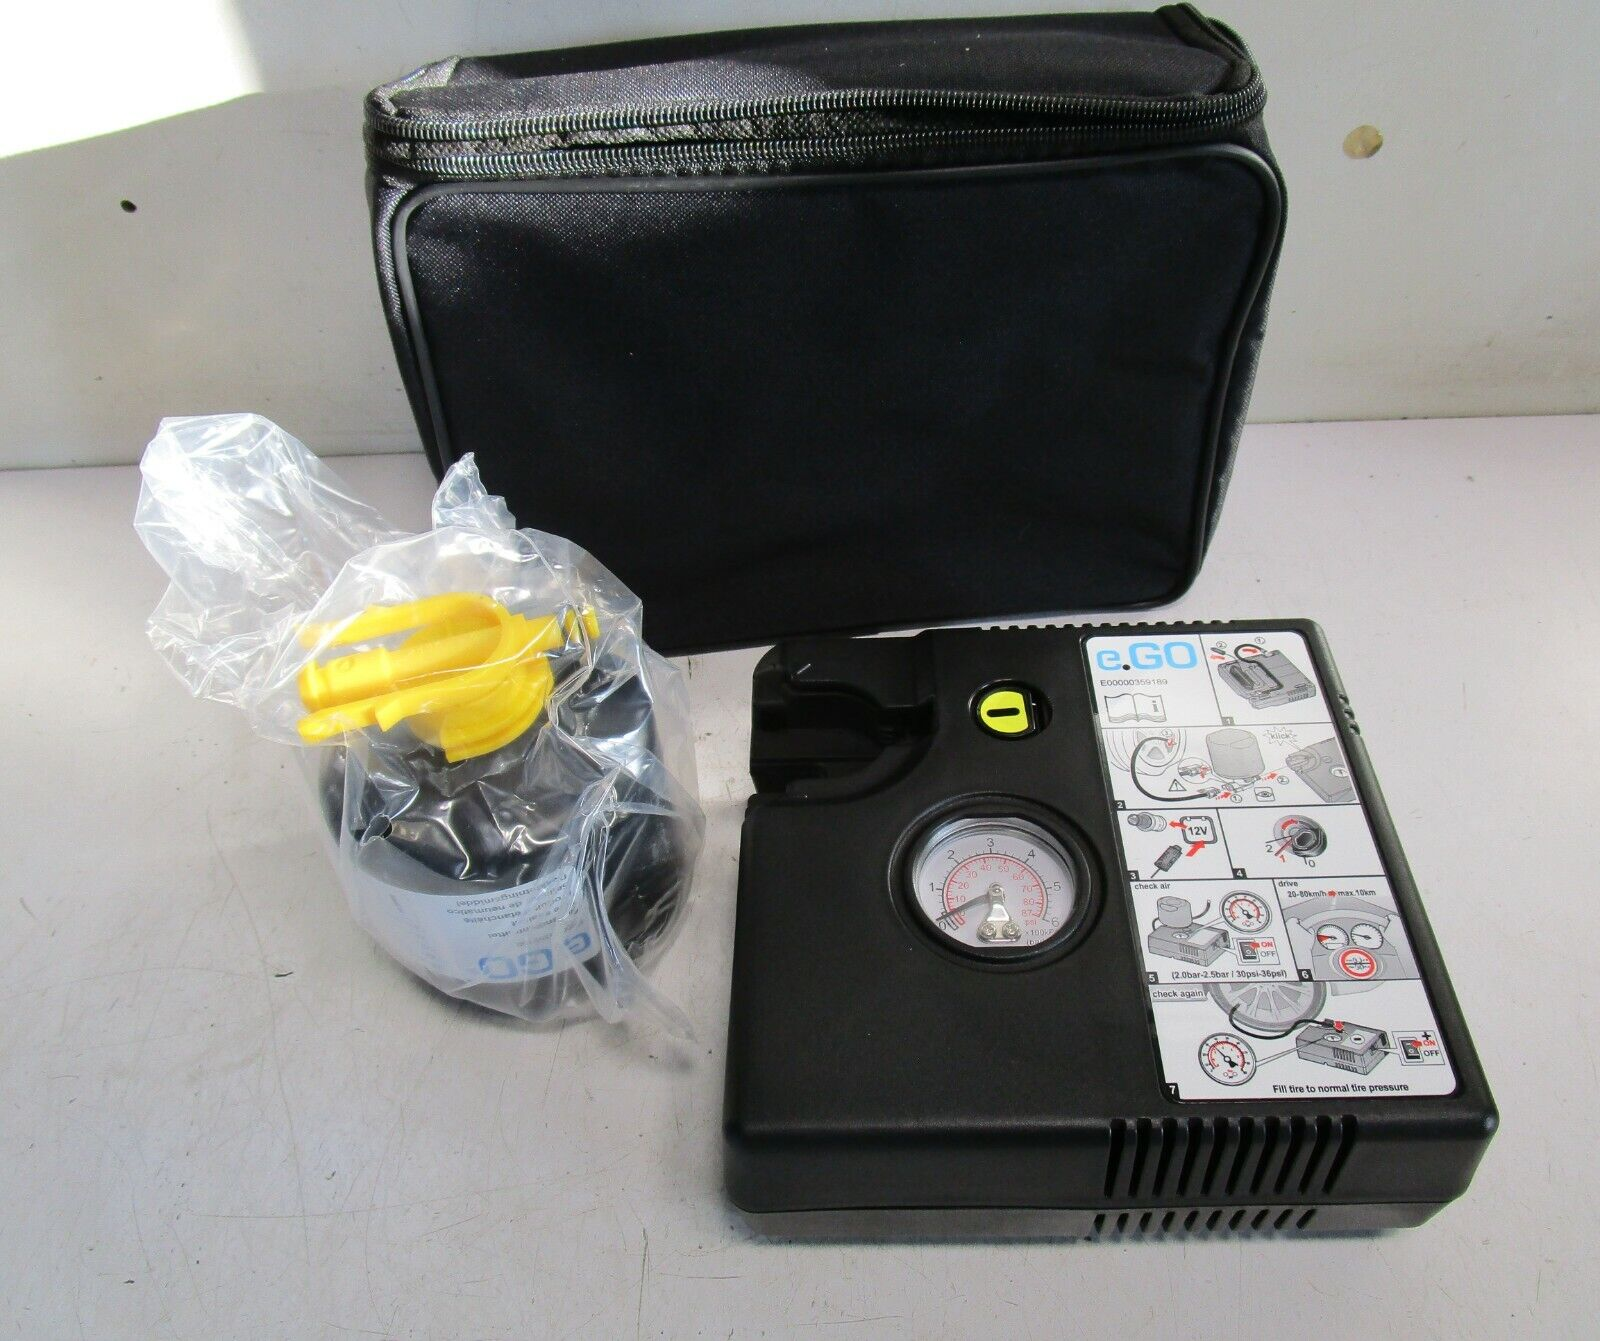 e.Go Life First Edition Pannenset Reifen elektrische Luftpumpe etc. E00000359189